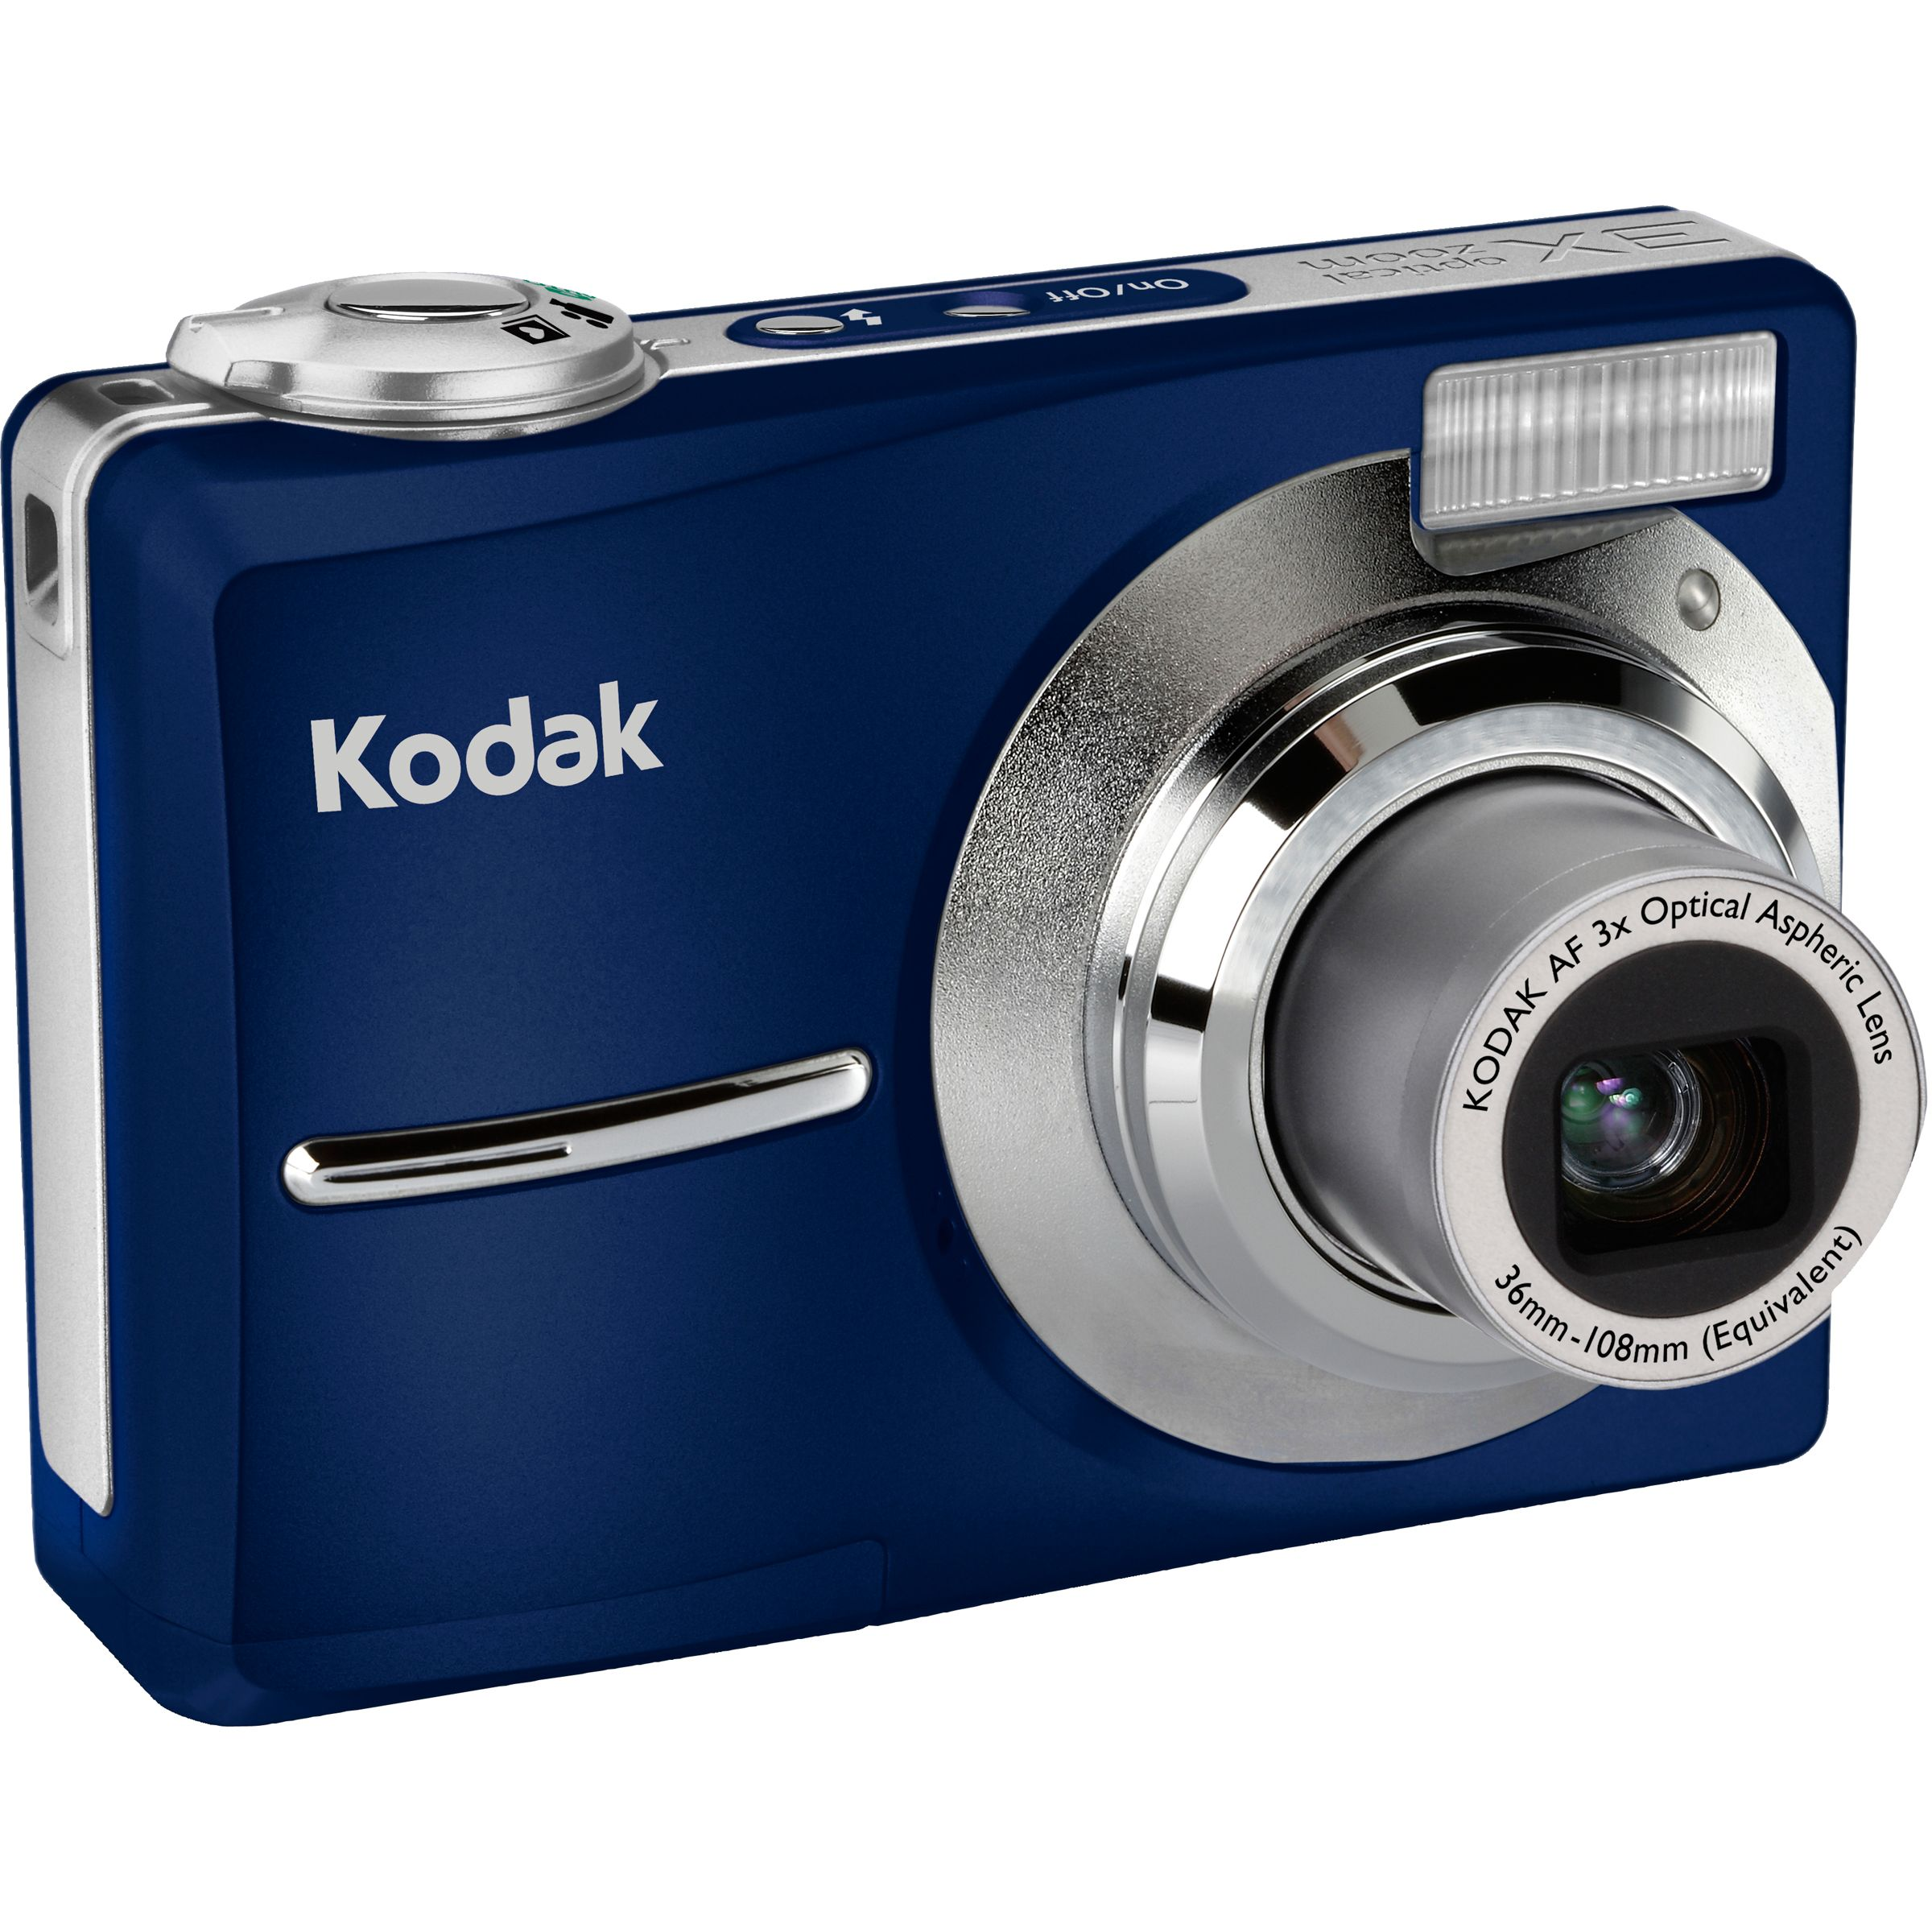 Kodak 9.2MP Digital Camera Bundle w/ 1GB SD Memory Card